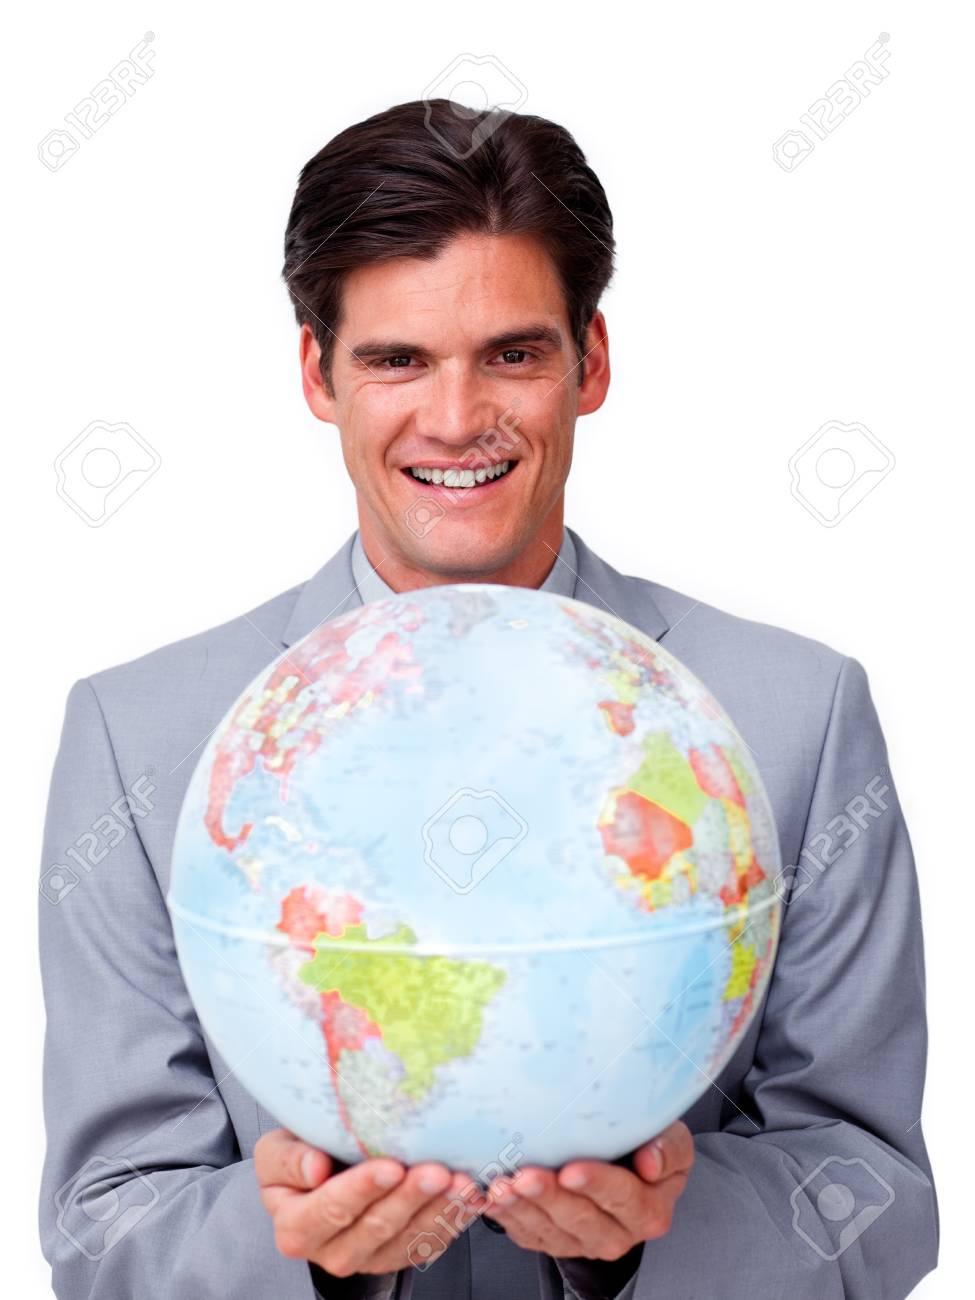 Handsome businessman holding a terrestrial globe Stock Photo - 10075728